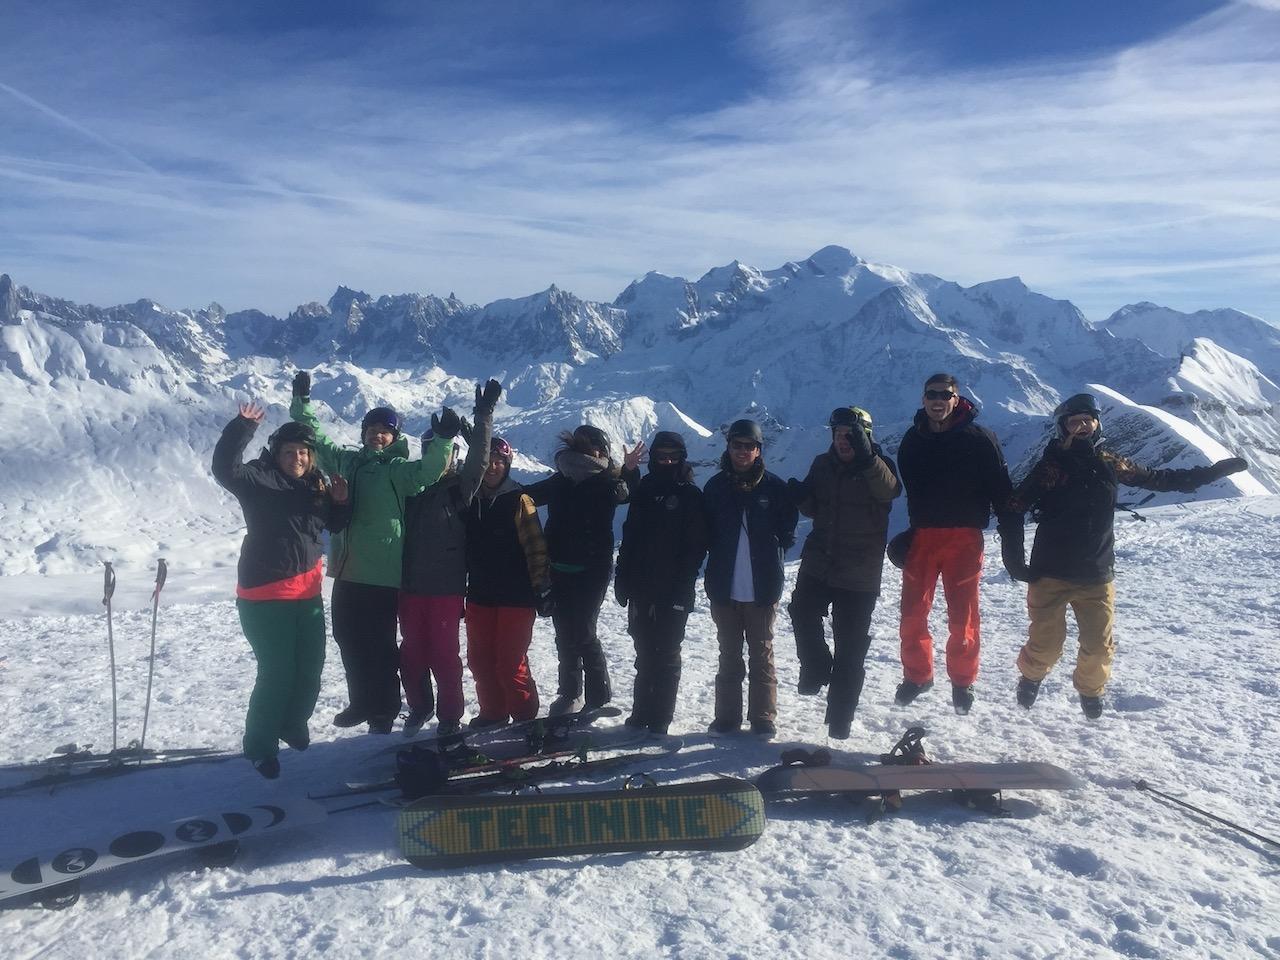 Group ski holidays in the Alp, jump for joy!